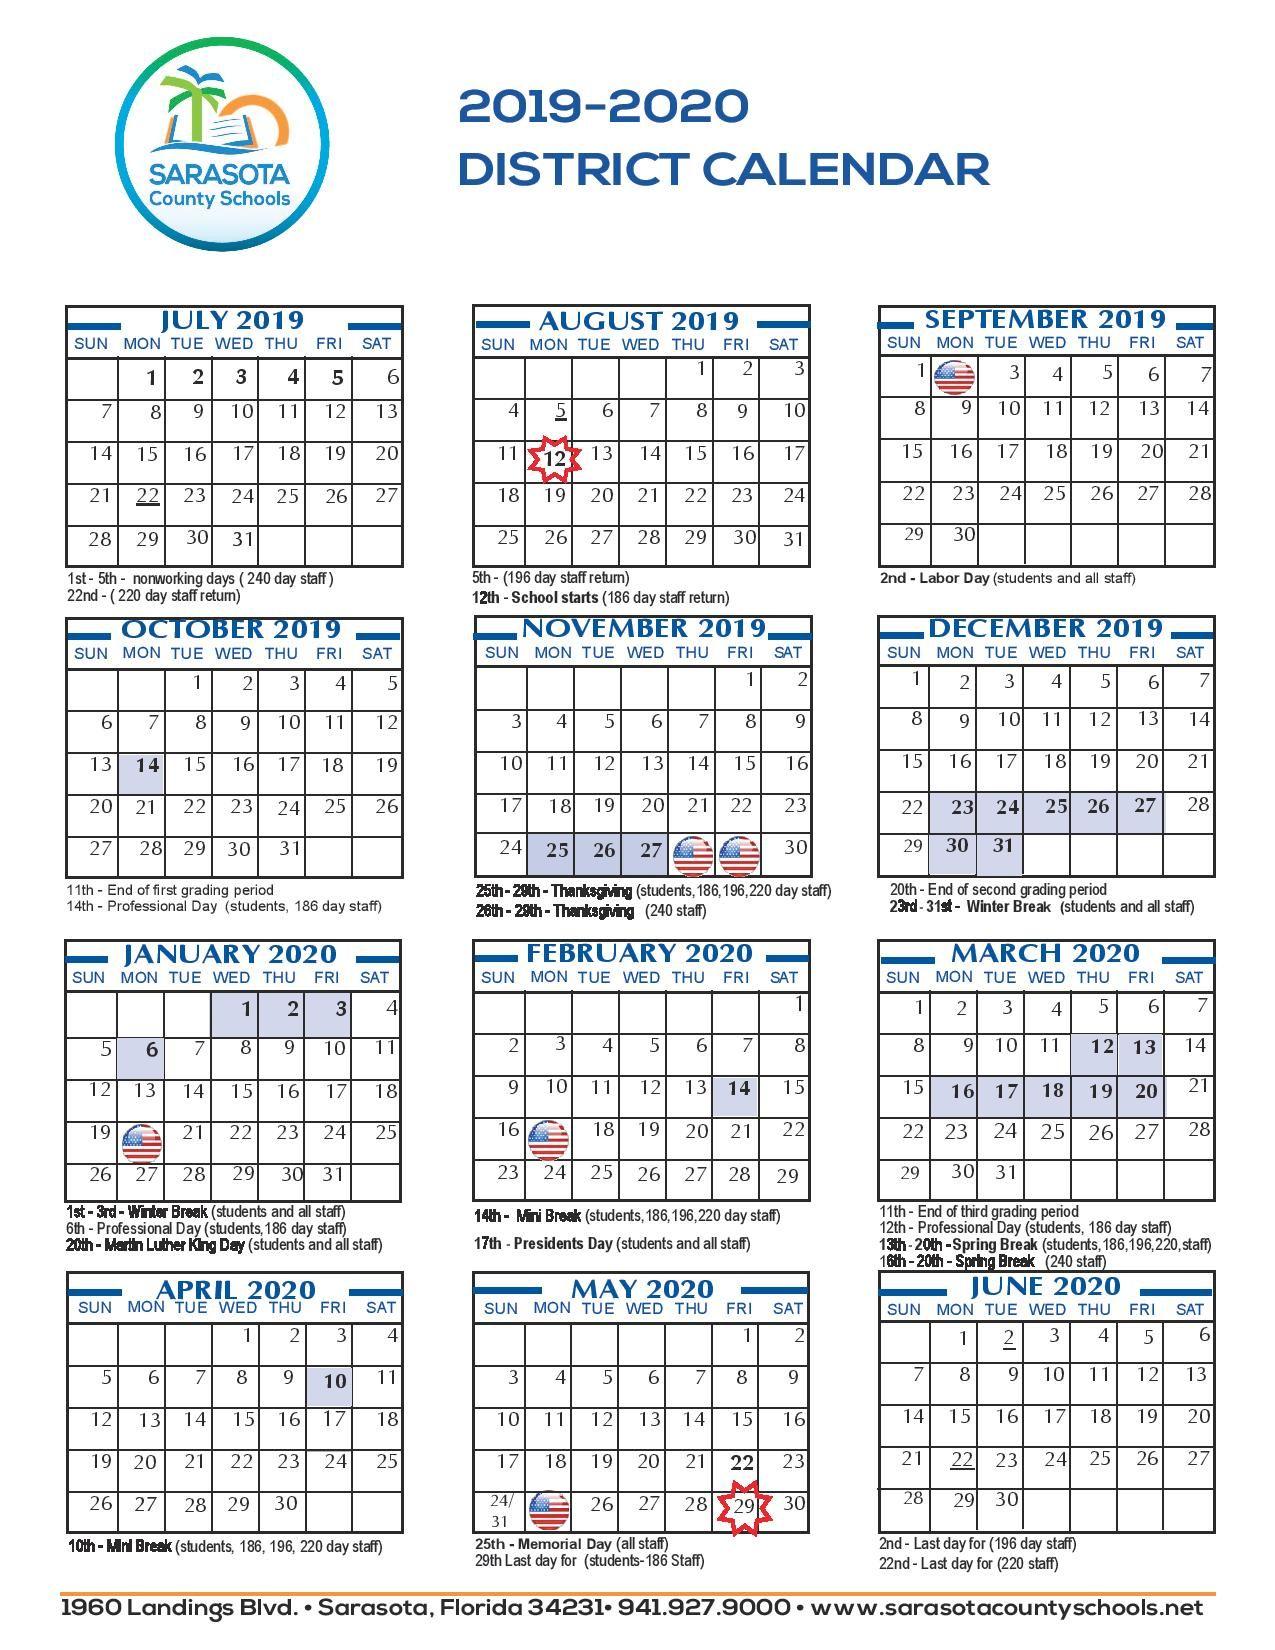 Sarasota County School Calendar Printable Free Download Https Www Youcalendars Com Sarasota School Calendar School Calendar Printables School Calendar Ideas